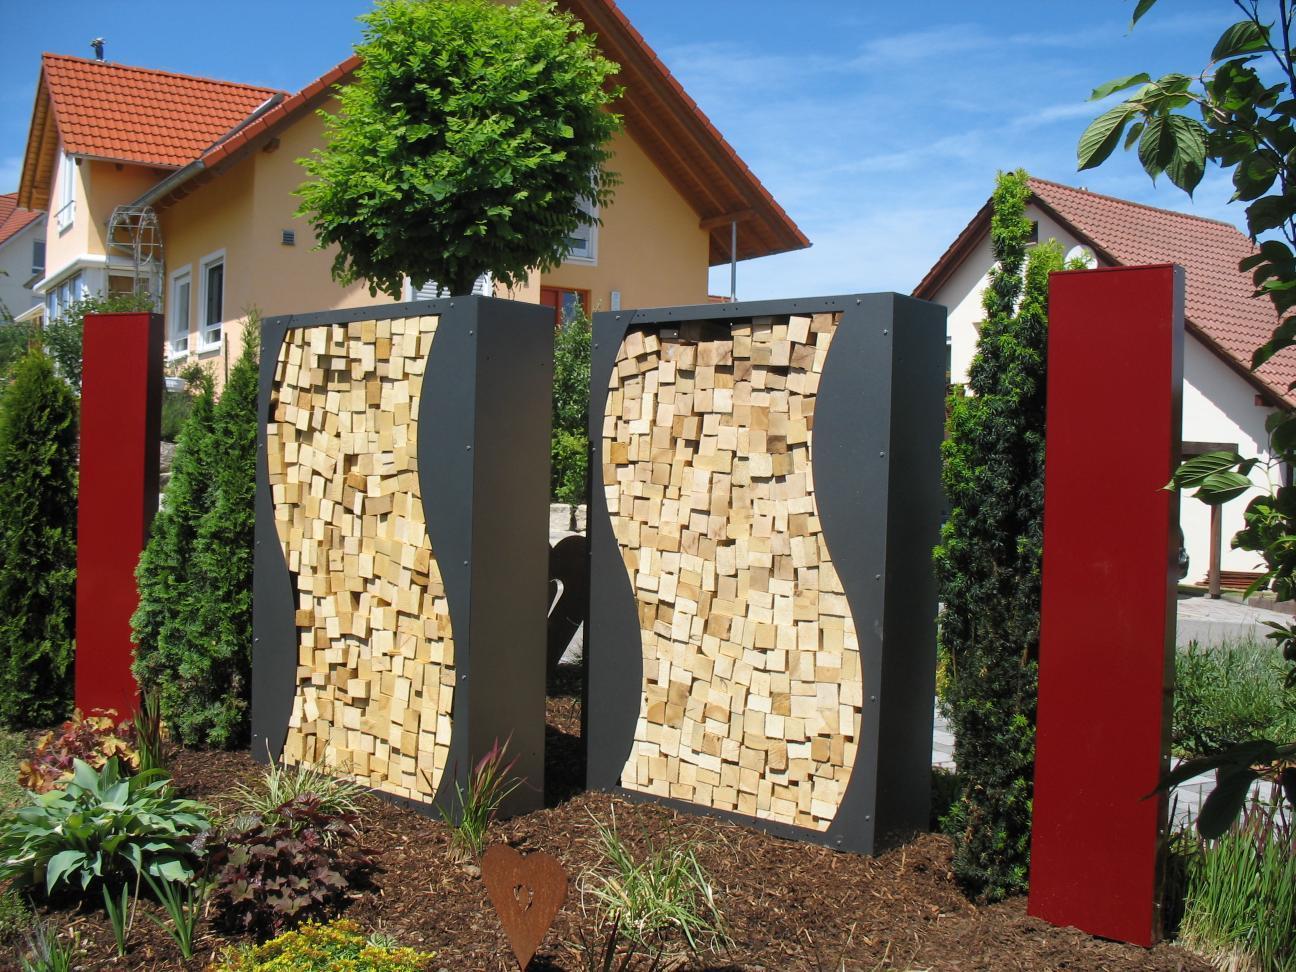 kaminholzregal metall 1 9 m x 1 0 m farbe nach ral karte. Black Bedroom Furniture Sets. Home Design Ideas